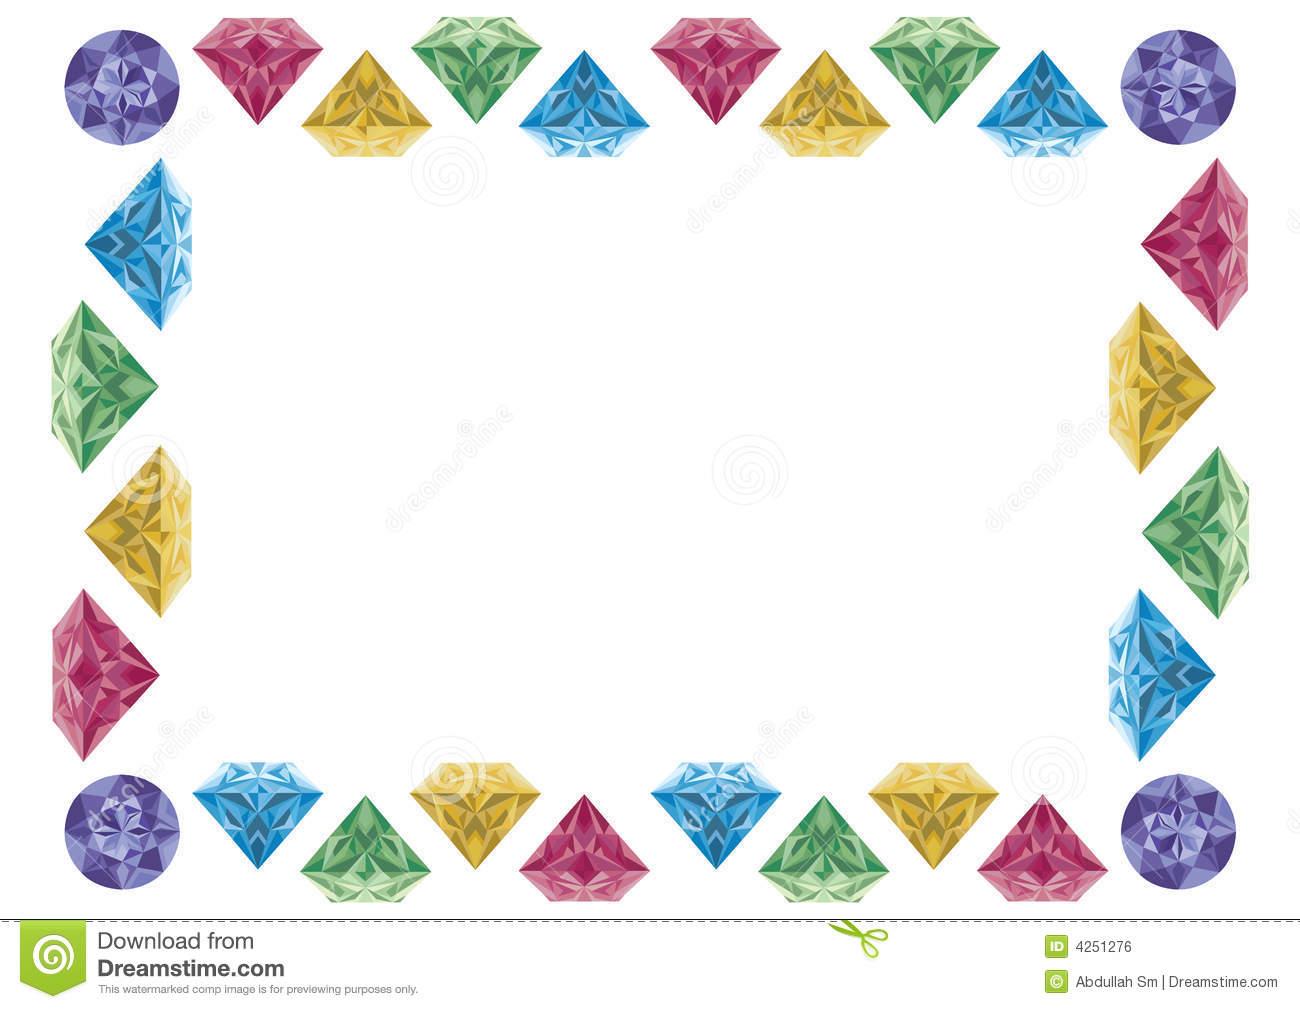 Necklace clipart border #4